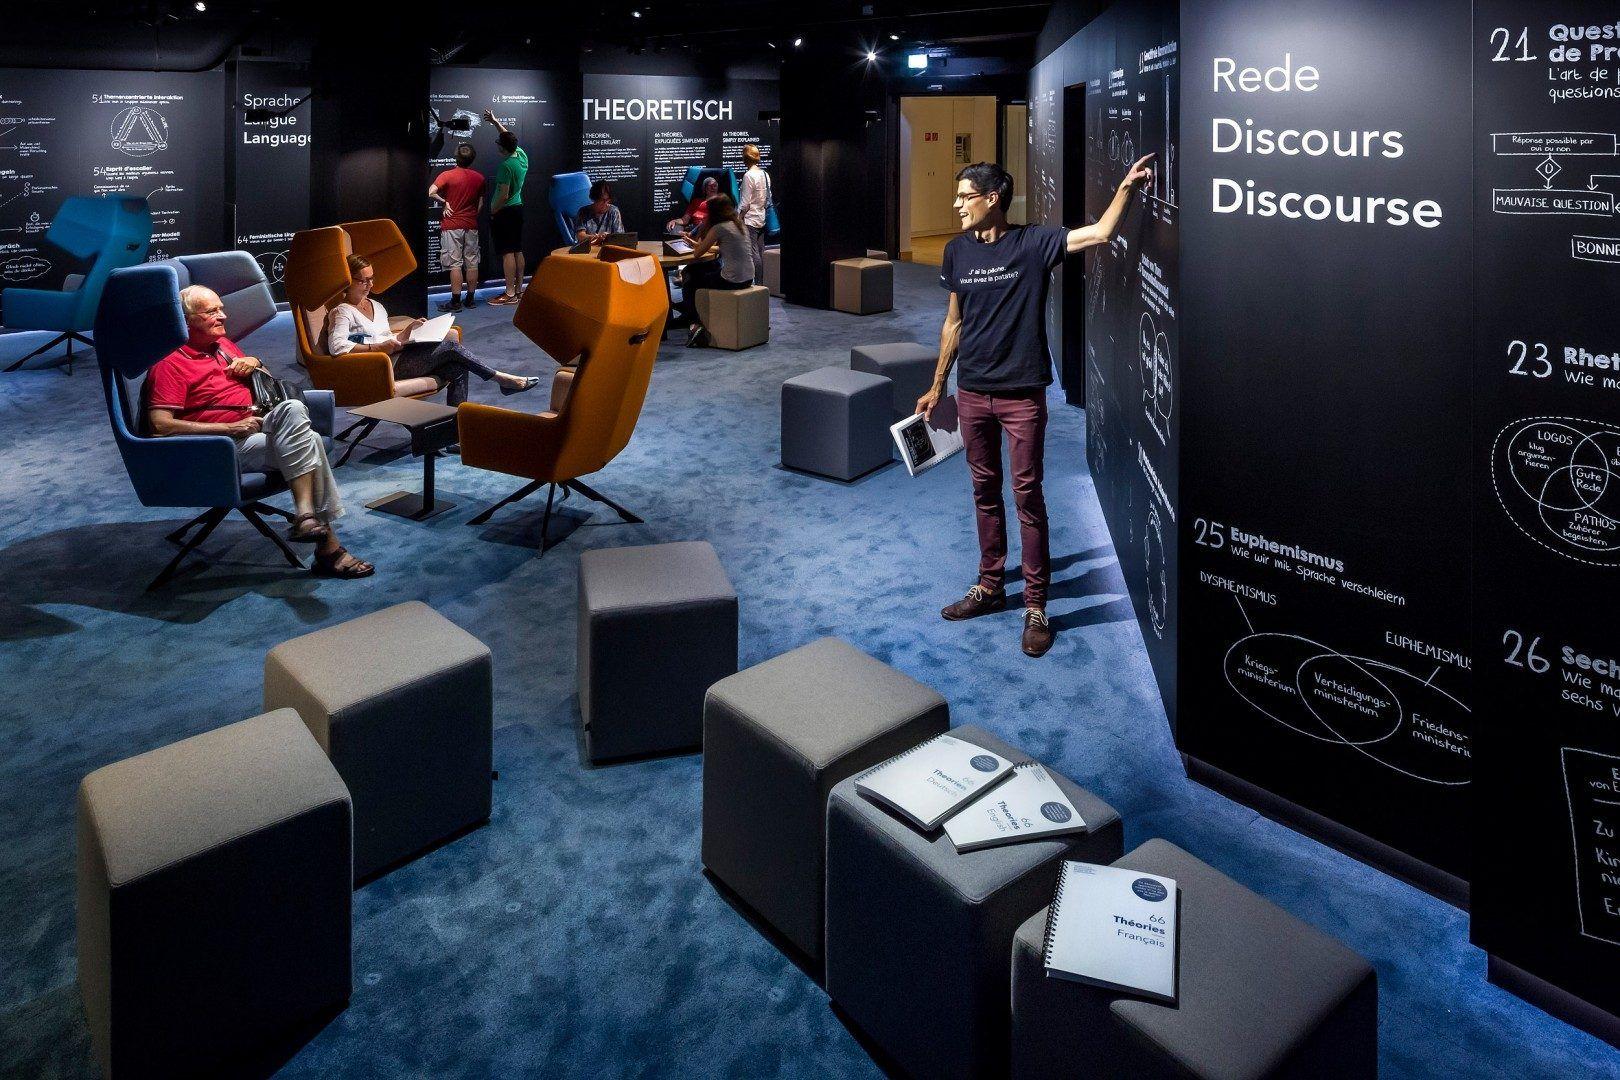 Museum F R Kommunikation Kossmann Dejong Museo Pinterest  # Muebles Bima Comedores